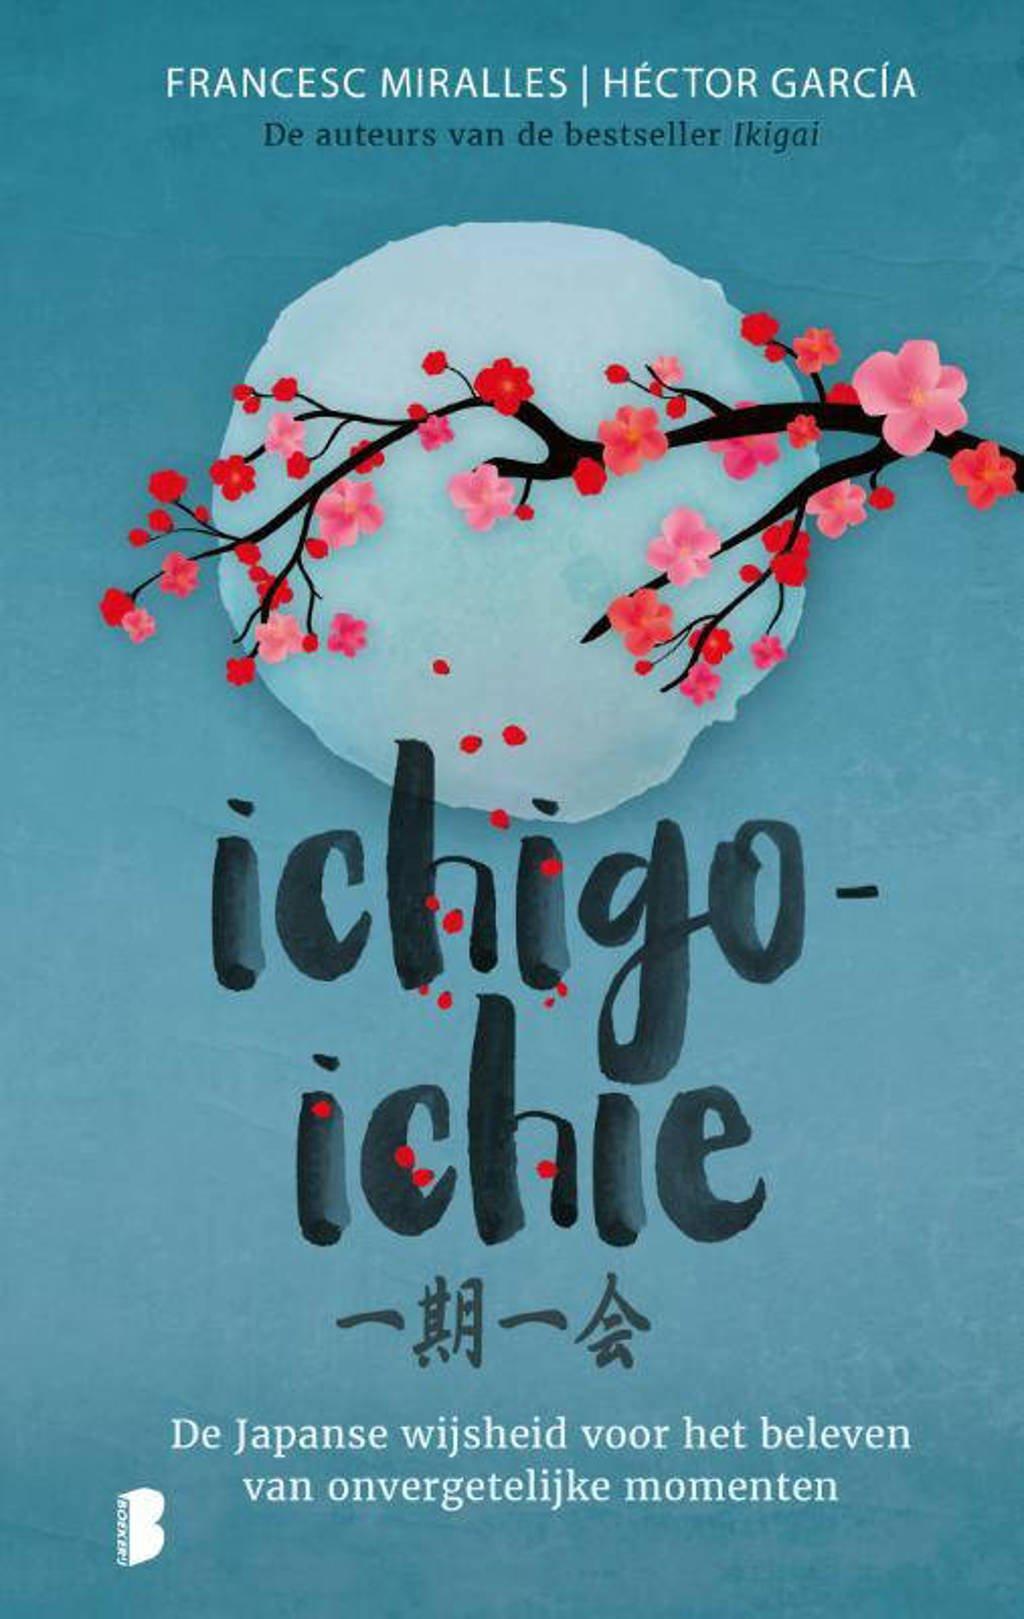 Ichigo-ichie - Francesc Miralles en Héctor García